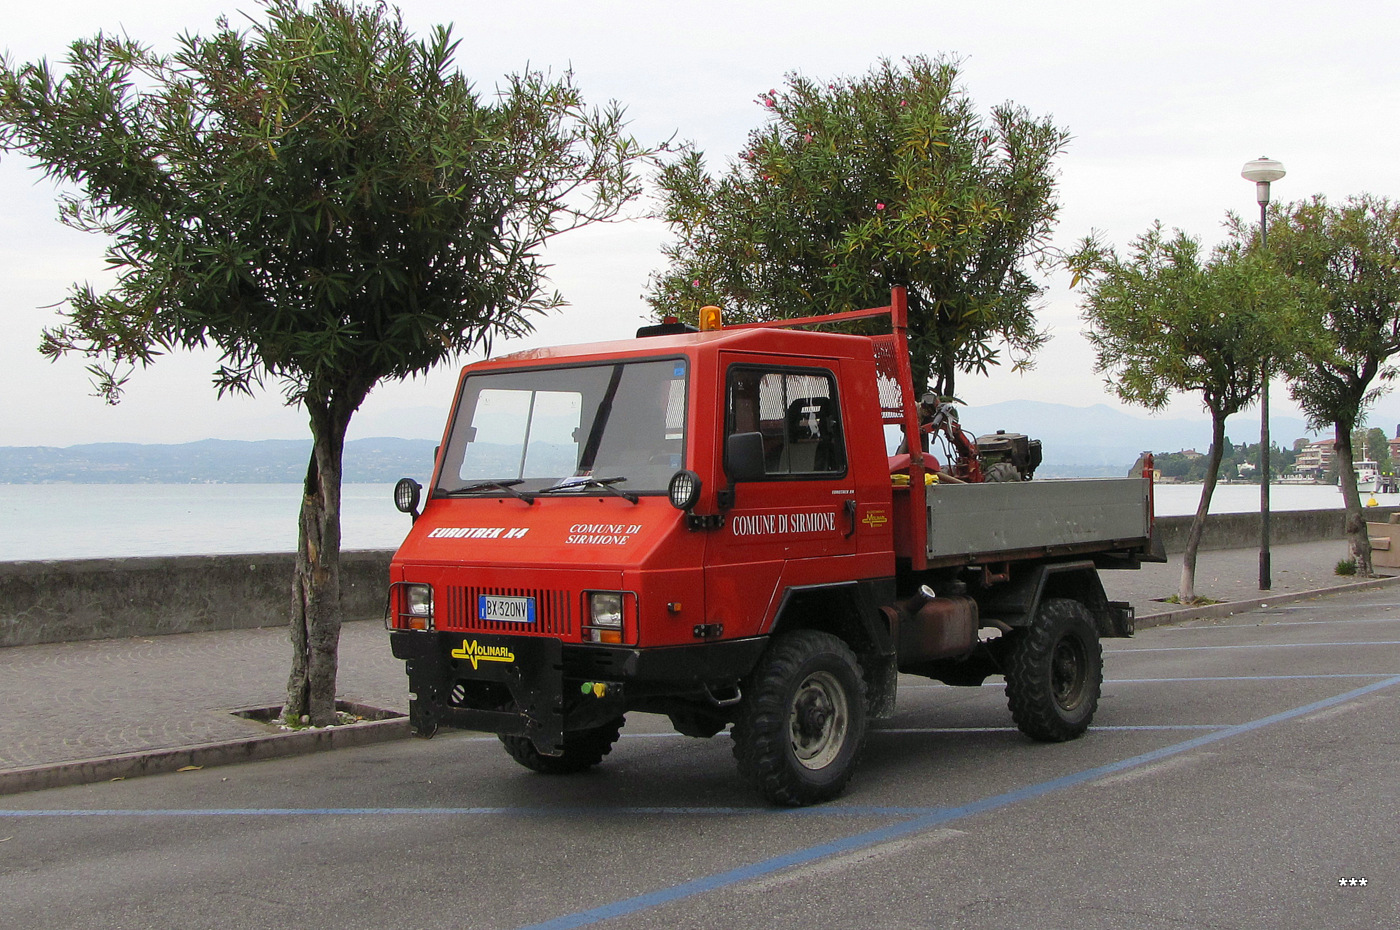 Автомобиль Teknocar Eurotrek X4. Италия, Сирмионе